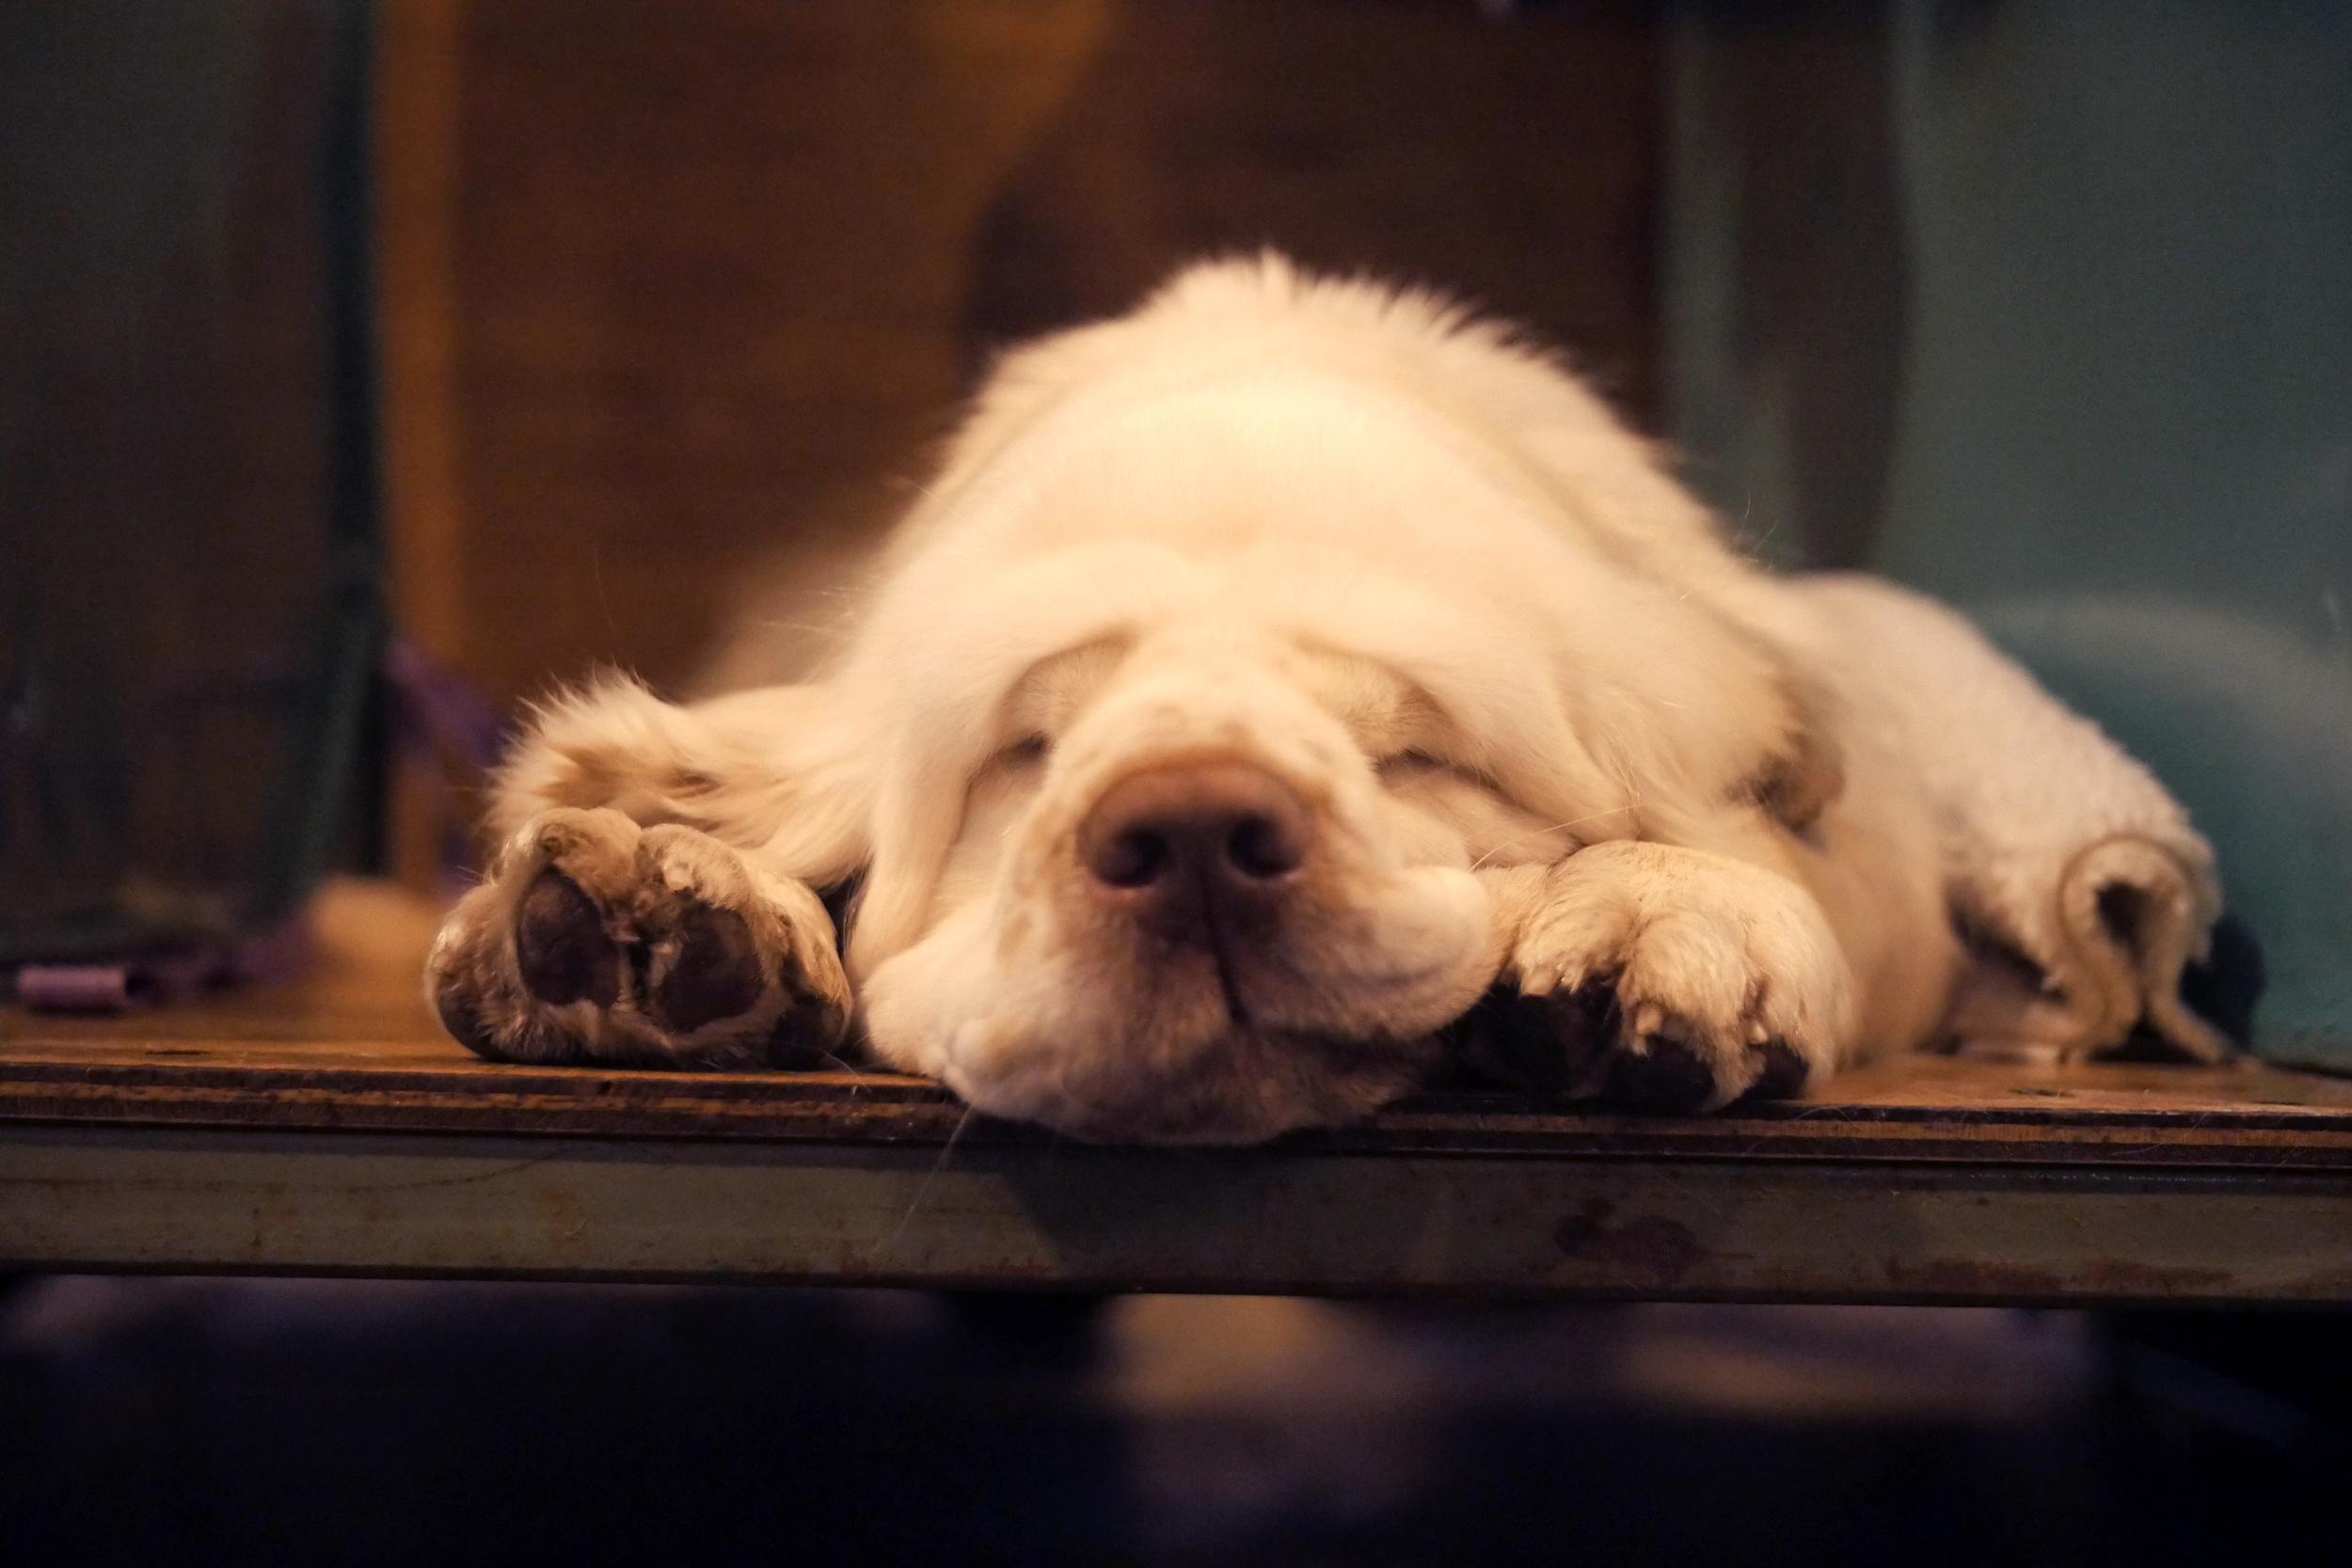 A clumber spaniel also enjoying some serious nap time.